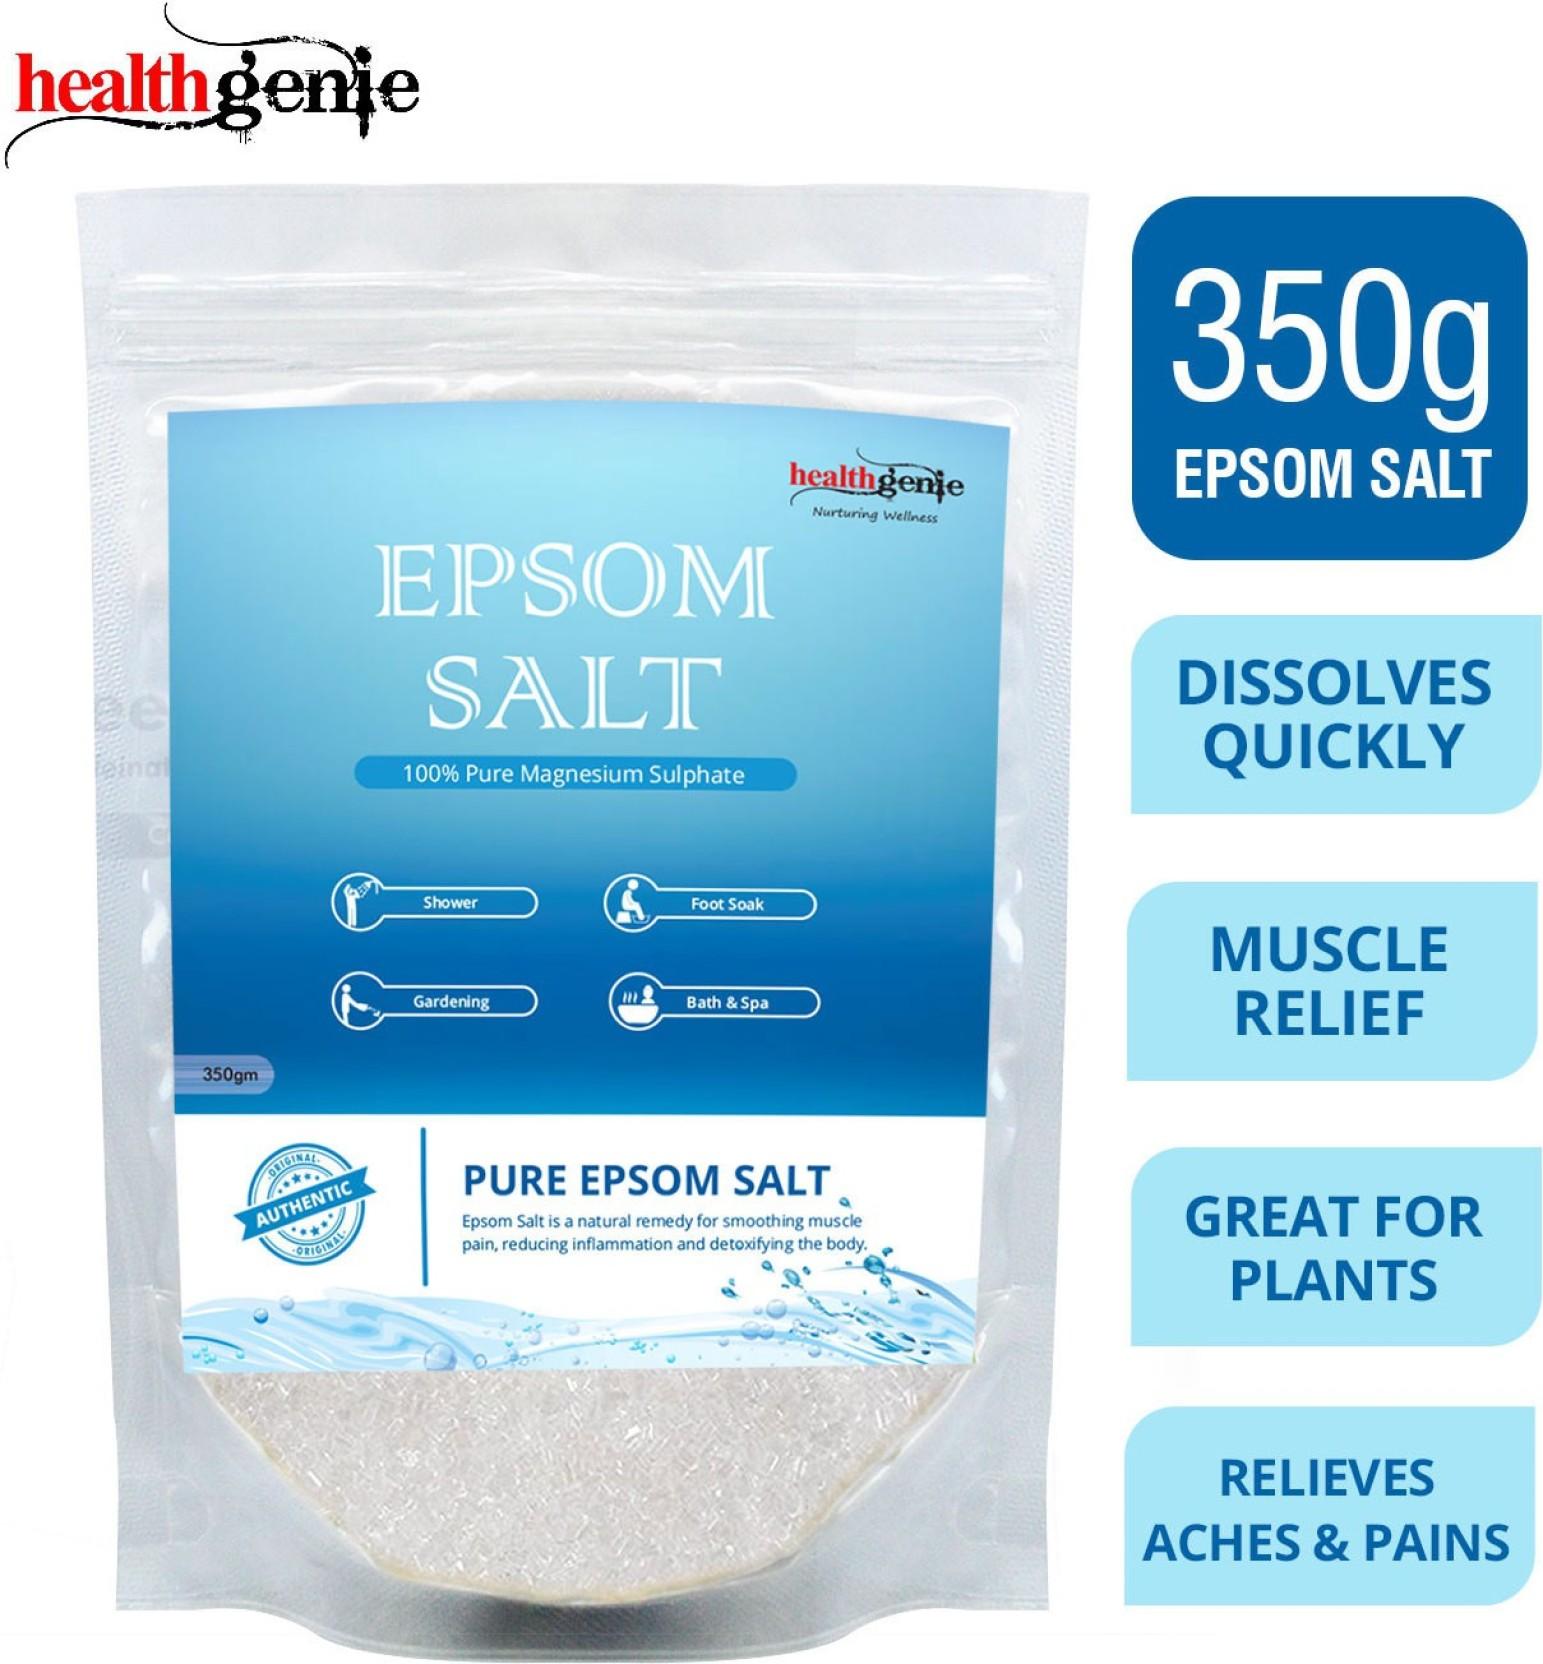 100% Pure Natural Magnesium Sulphate Epsom Salts Bath Soak Un Scented Spa Salt Moderate Price Health & Beauty Health & Beauty